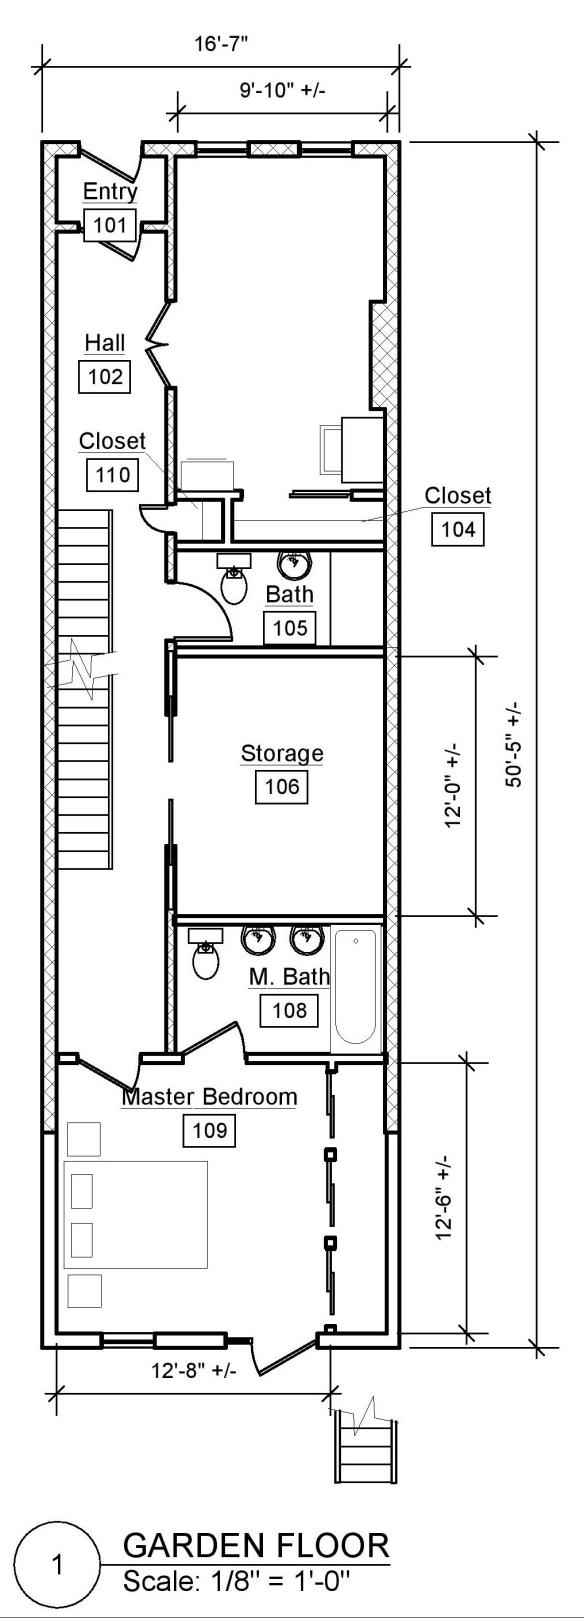 parlour-floor-final1.jpg